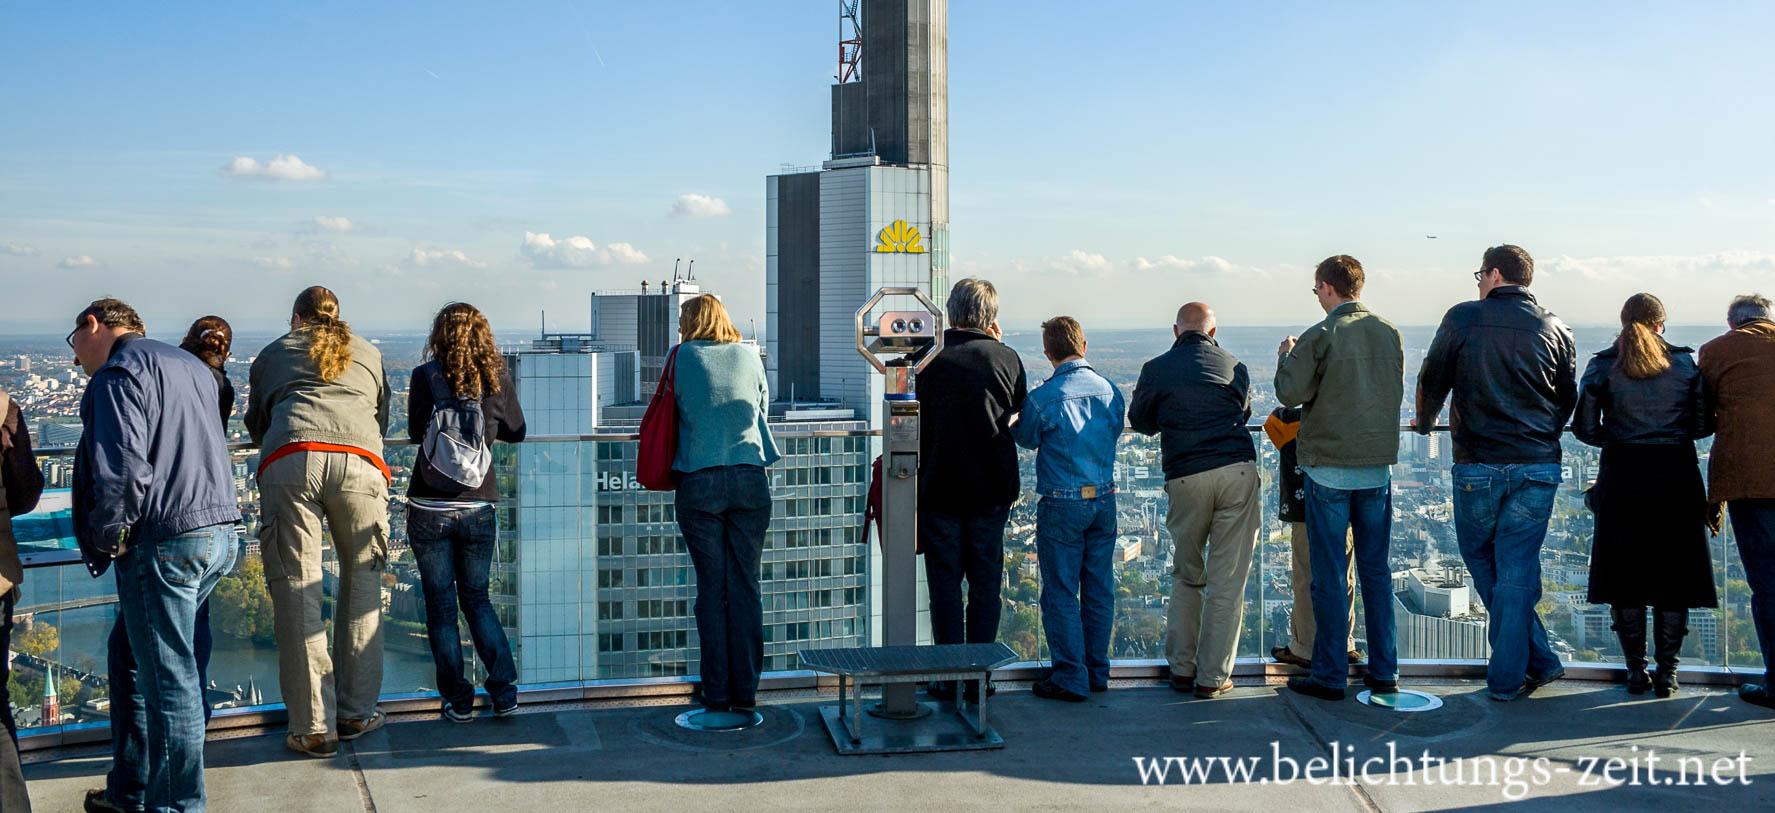 Looking at Frankfurt